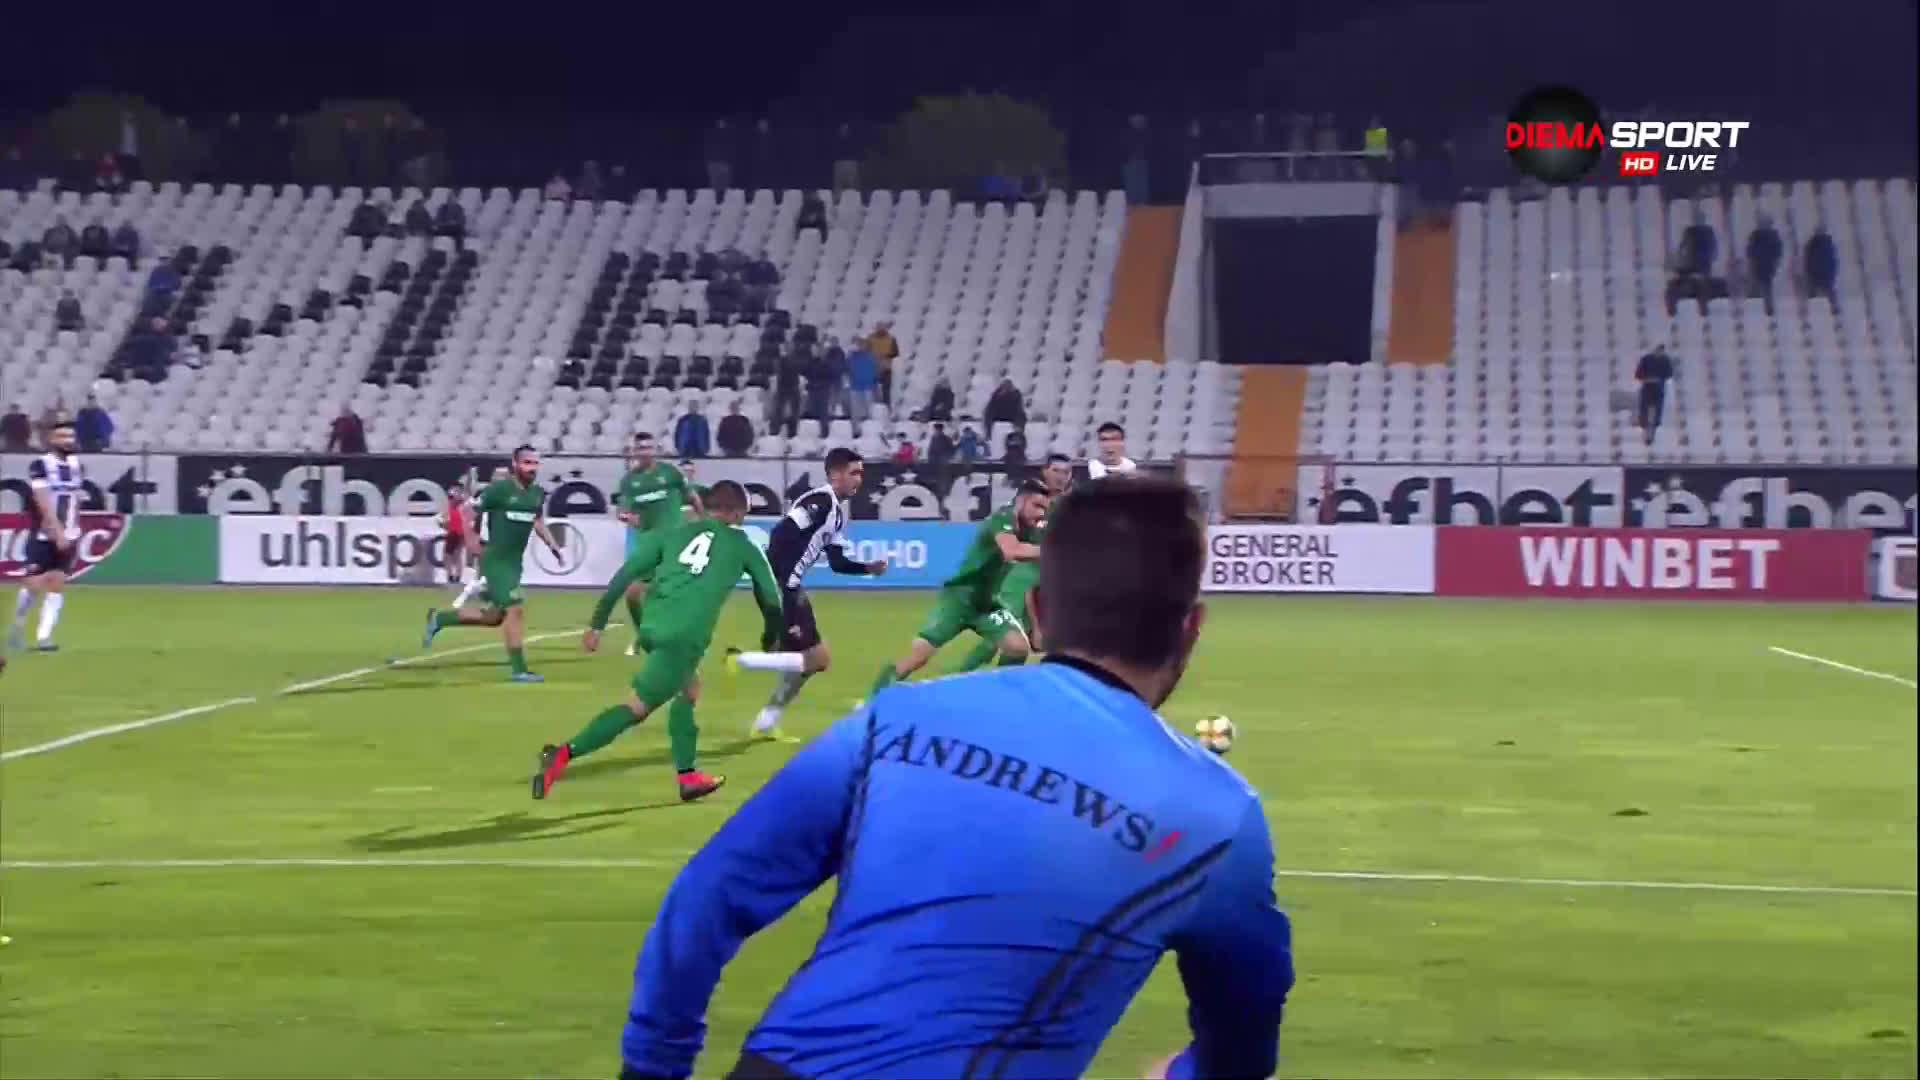 Фамозен гол даде аванс на Локо Пд срещу Ботев Враца